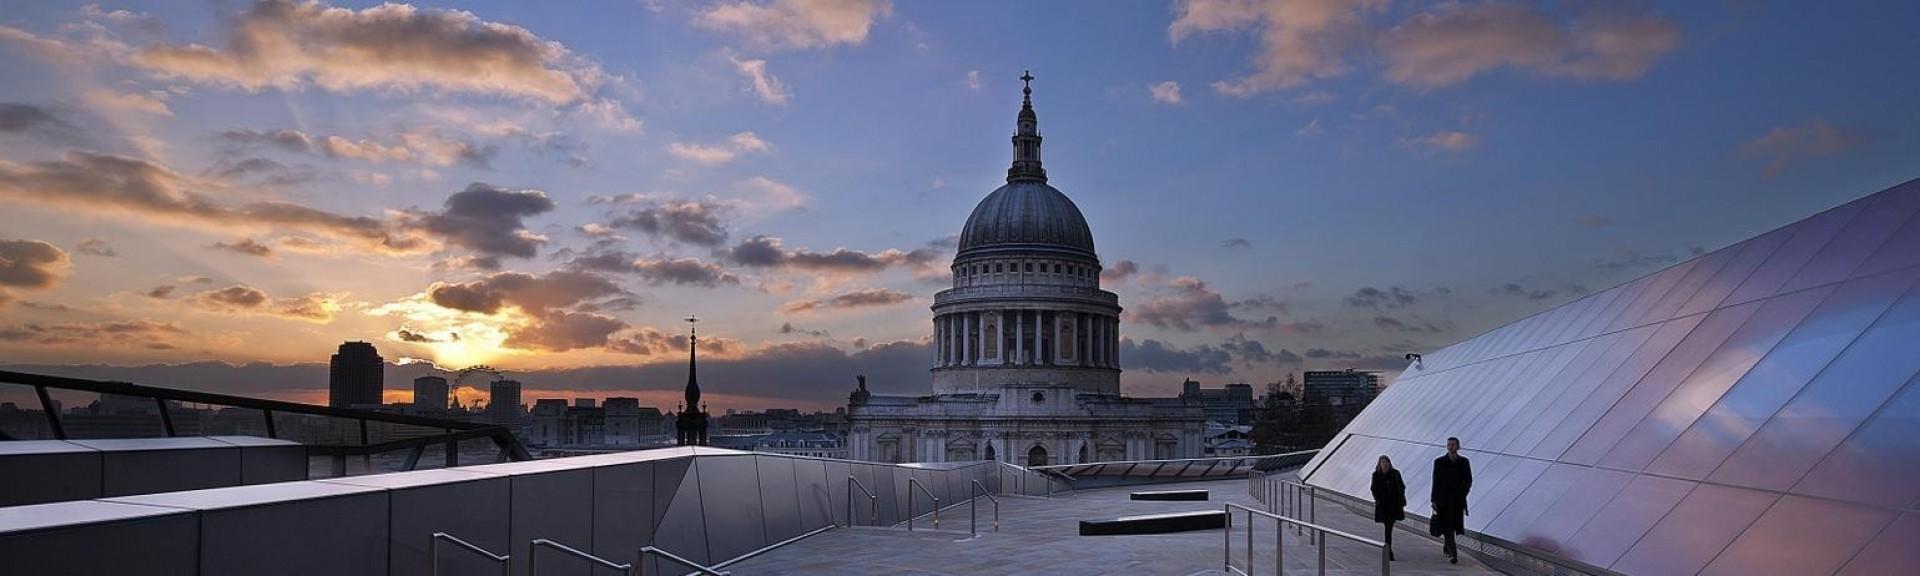 کلیسای جامع سنت پل لندن